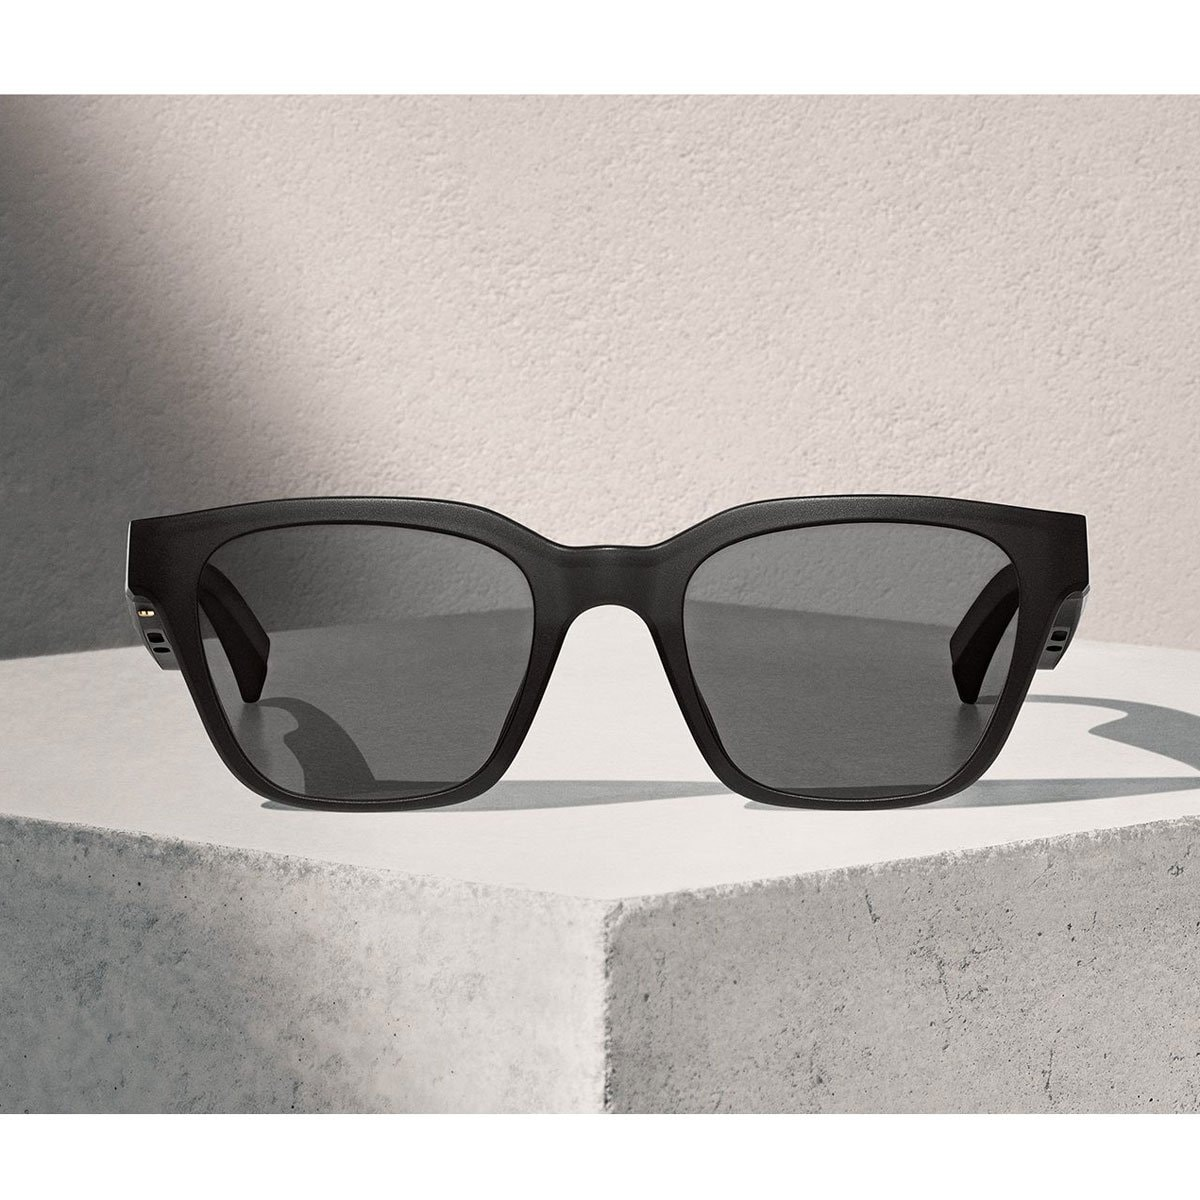 Lentes de Sol Bose Frames Alto Blk Row Negro